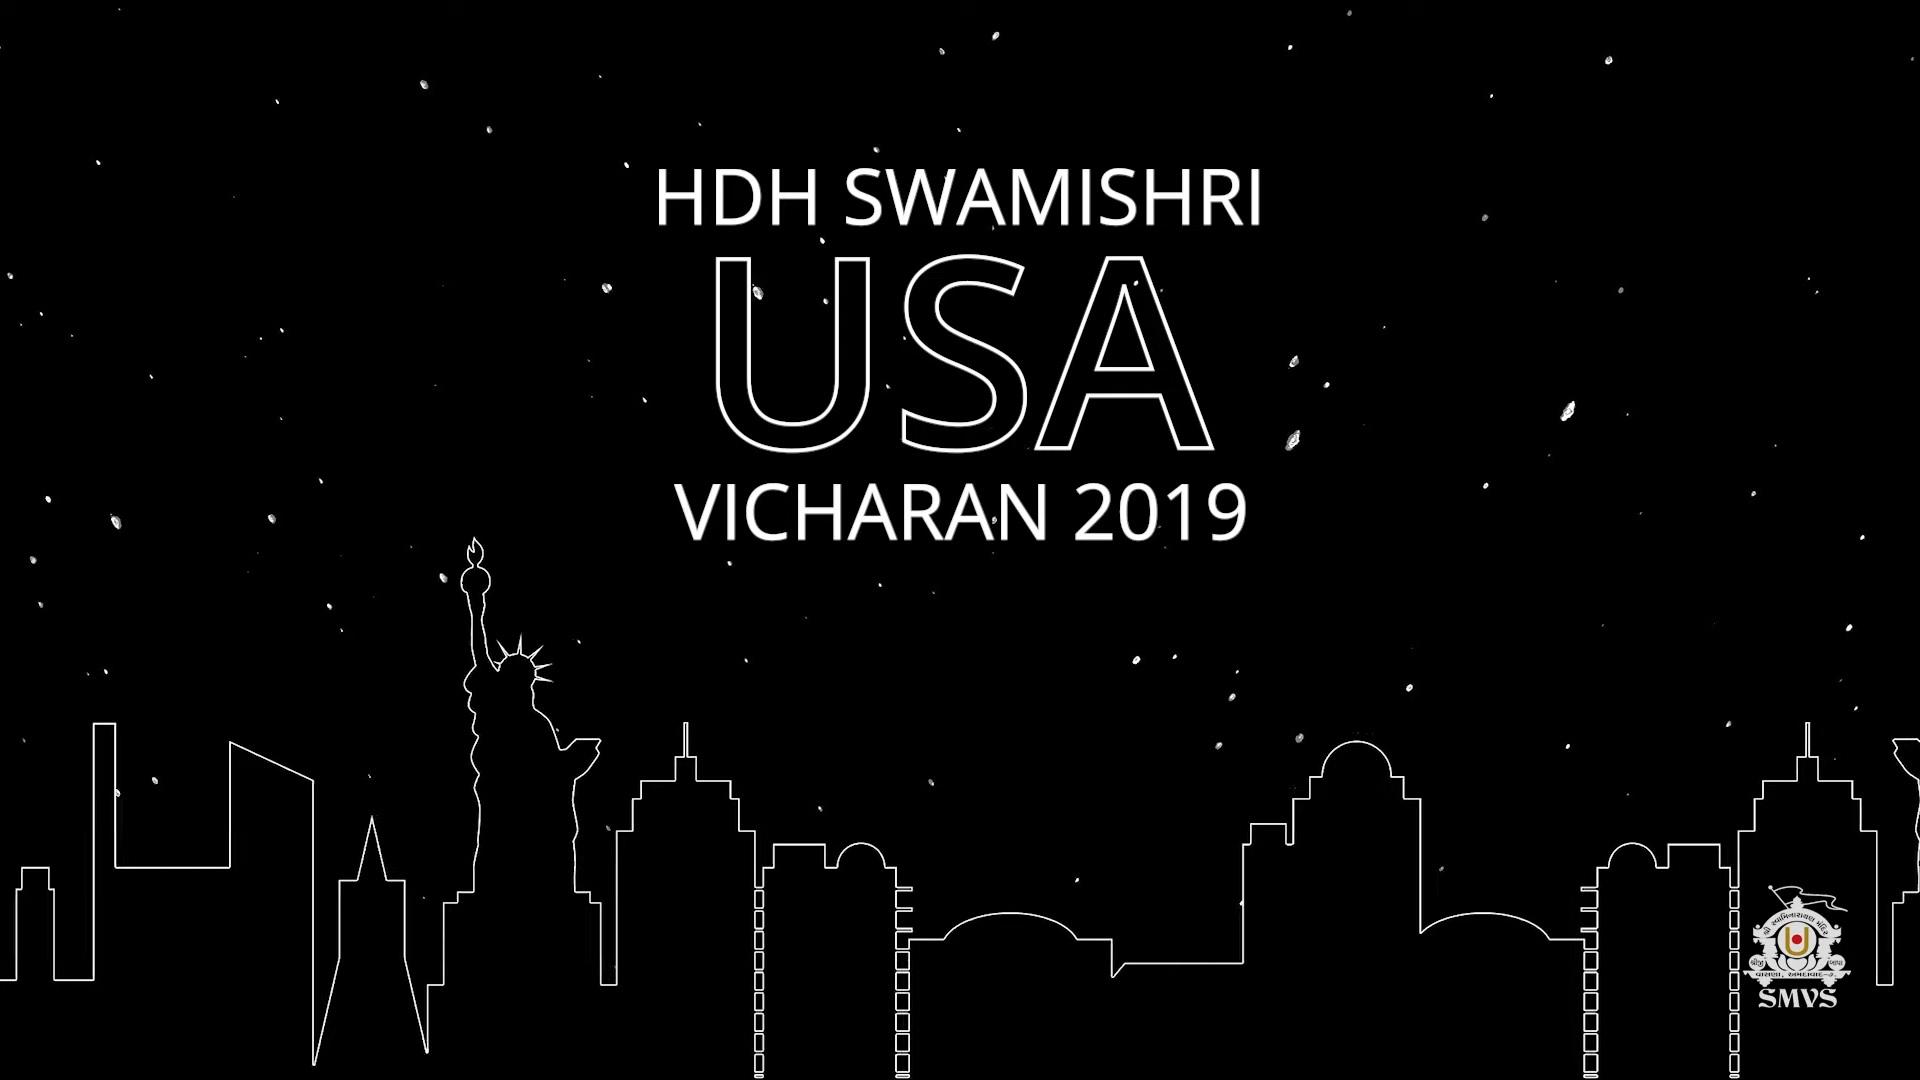 HDH Swamishri USA Vicharan - 2019